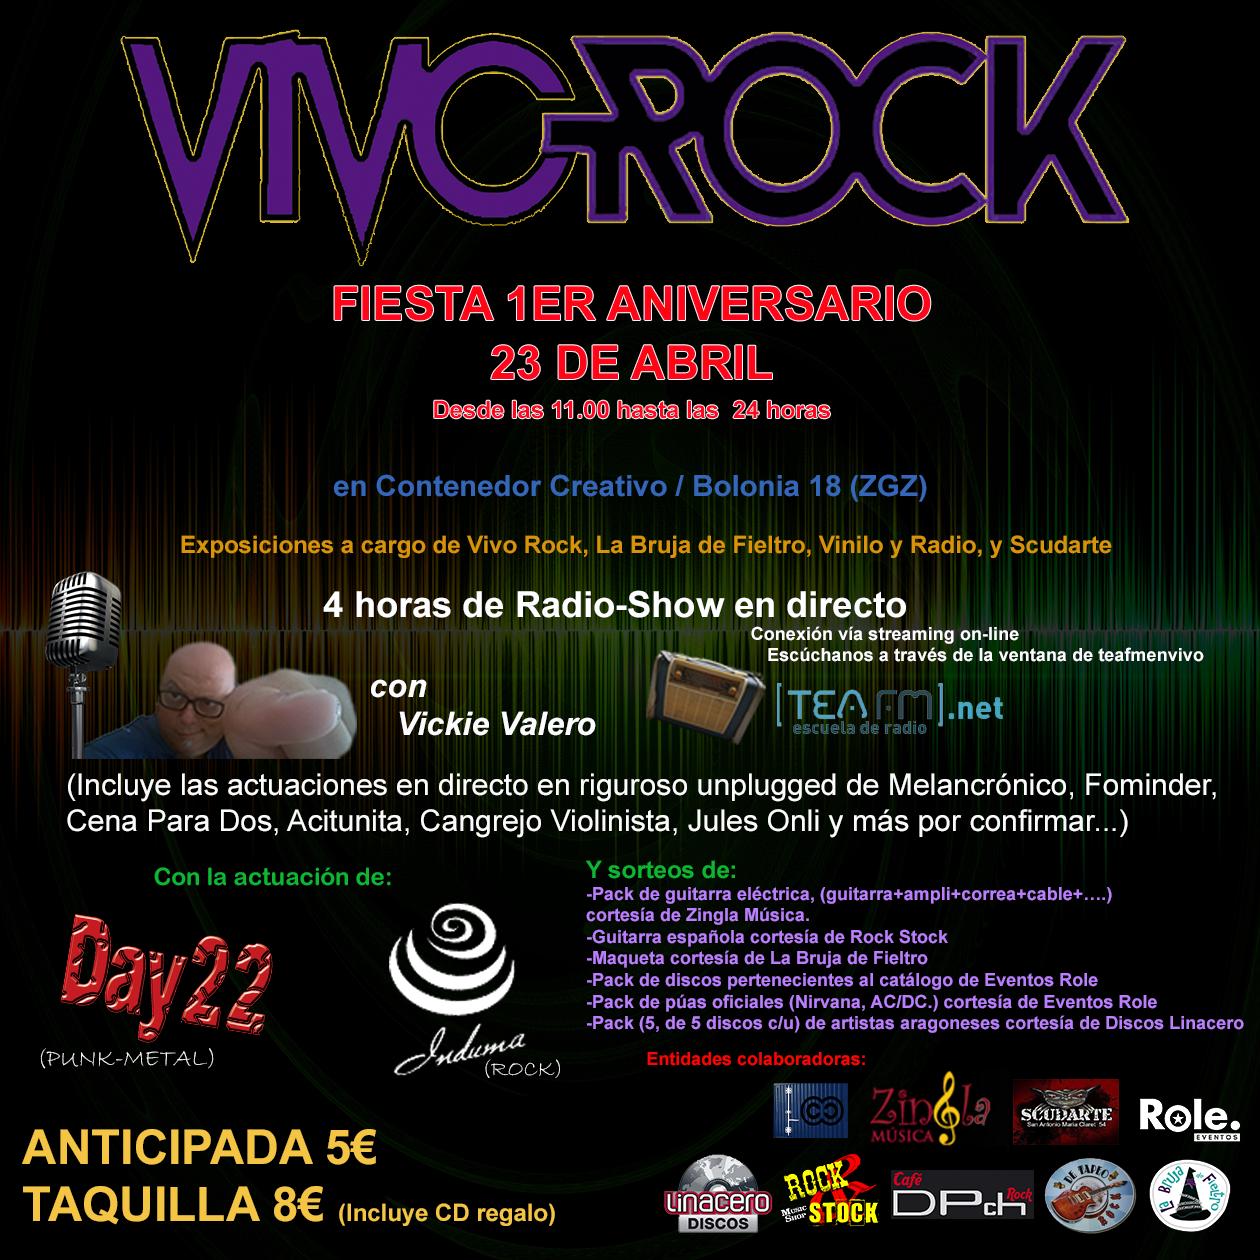 1er Aniversario Vivo Rock